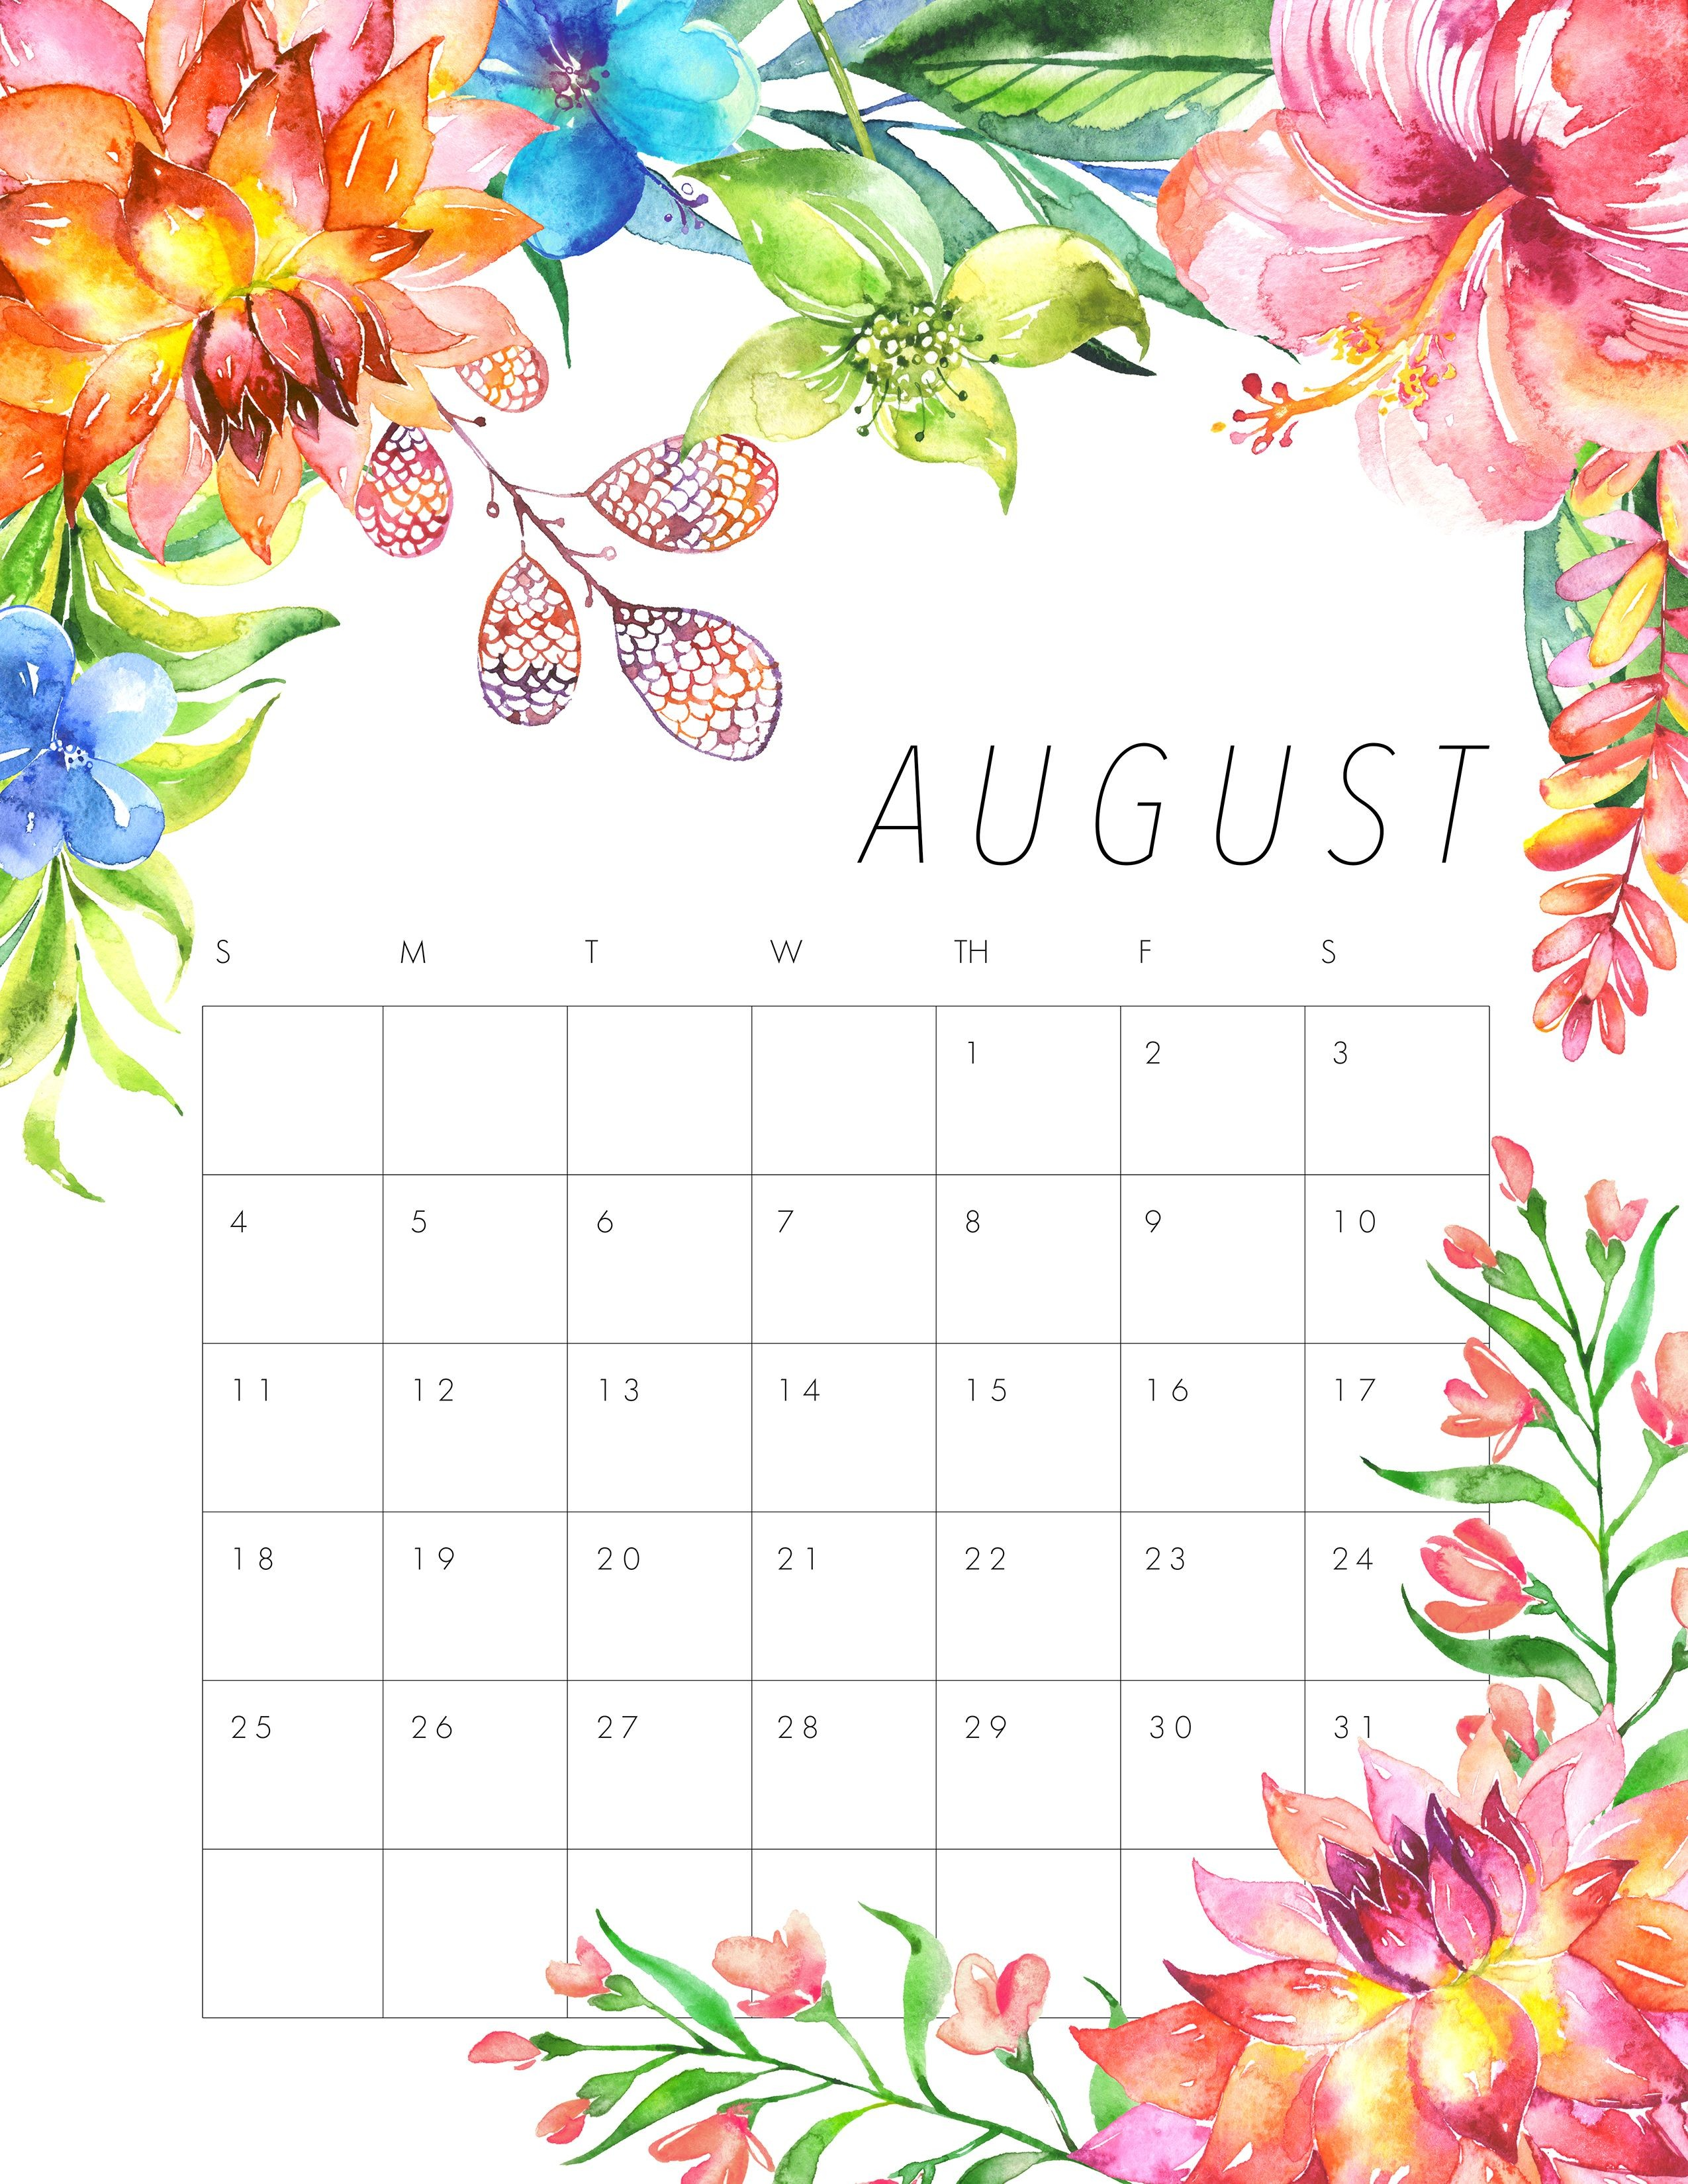 Calendar Wallpaper 2017 August Wallpaper 2018 Printable Calendar Family Calendar August Month